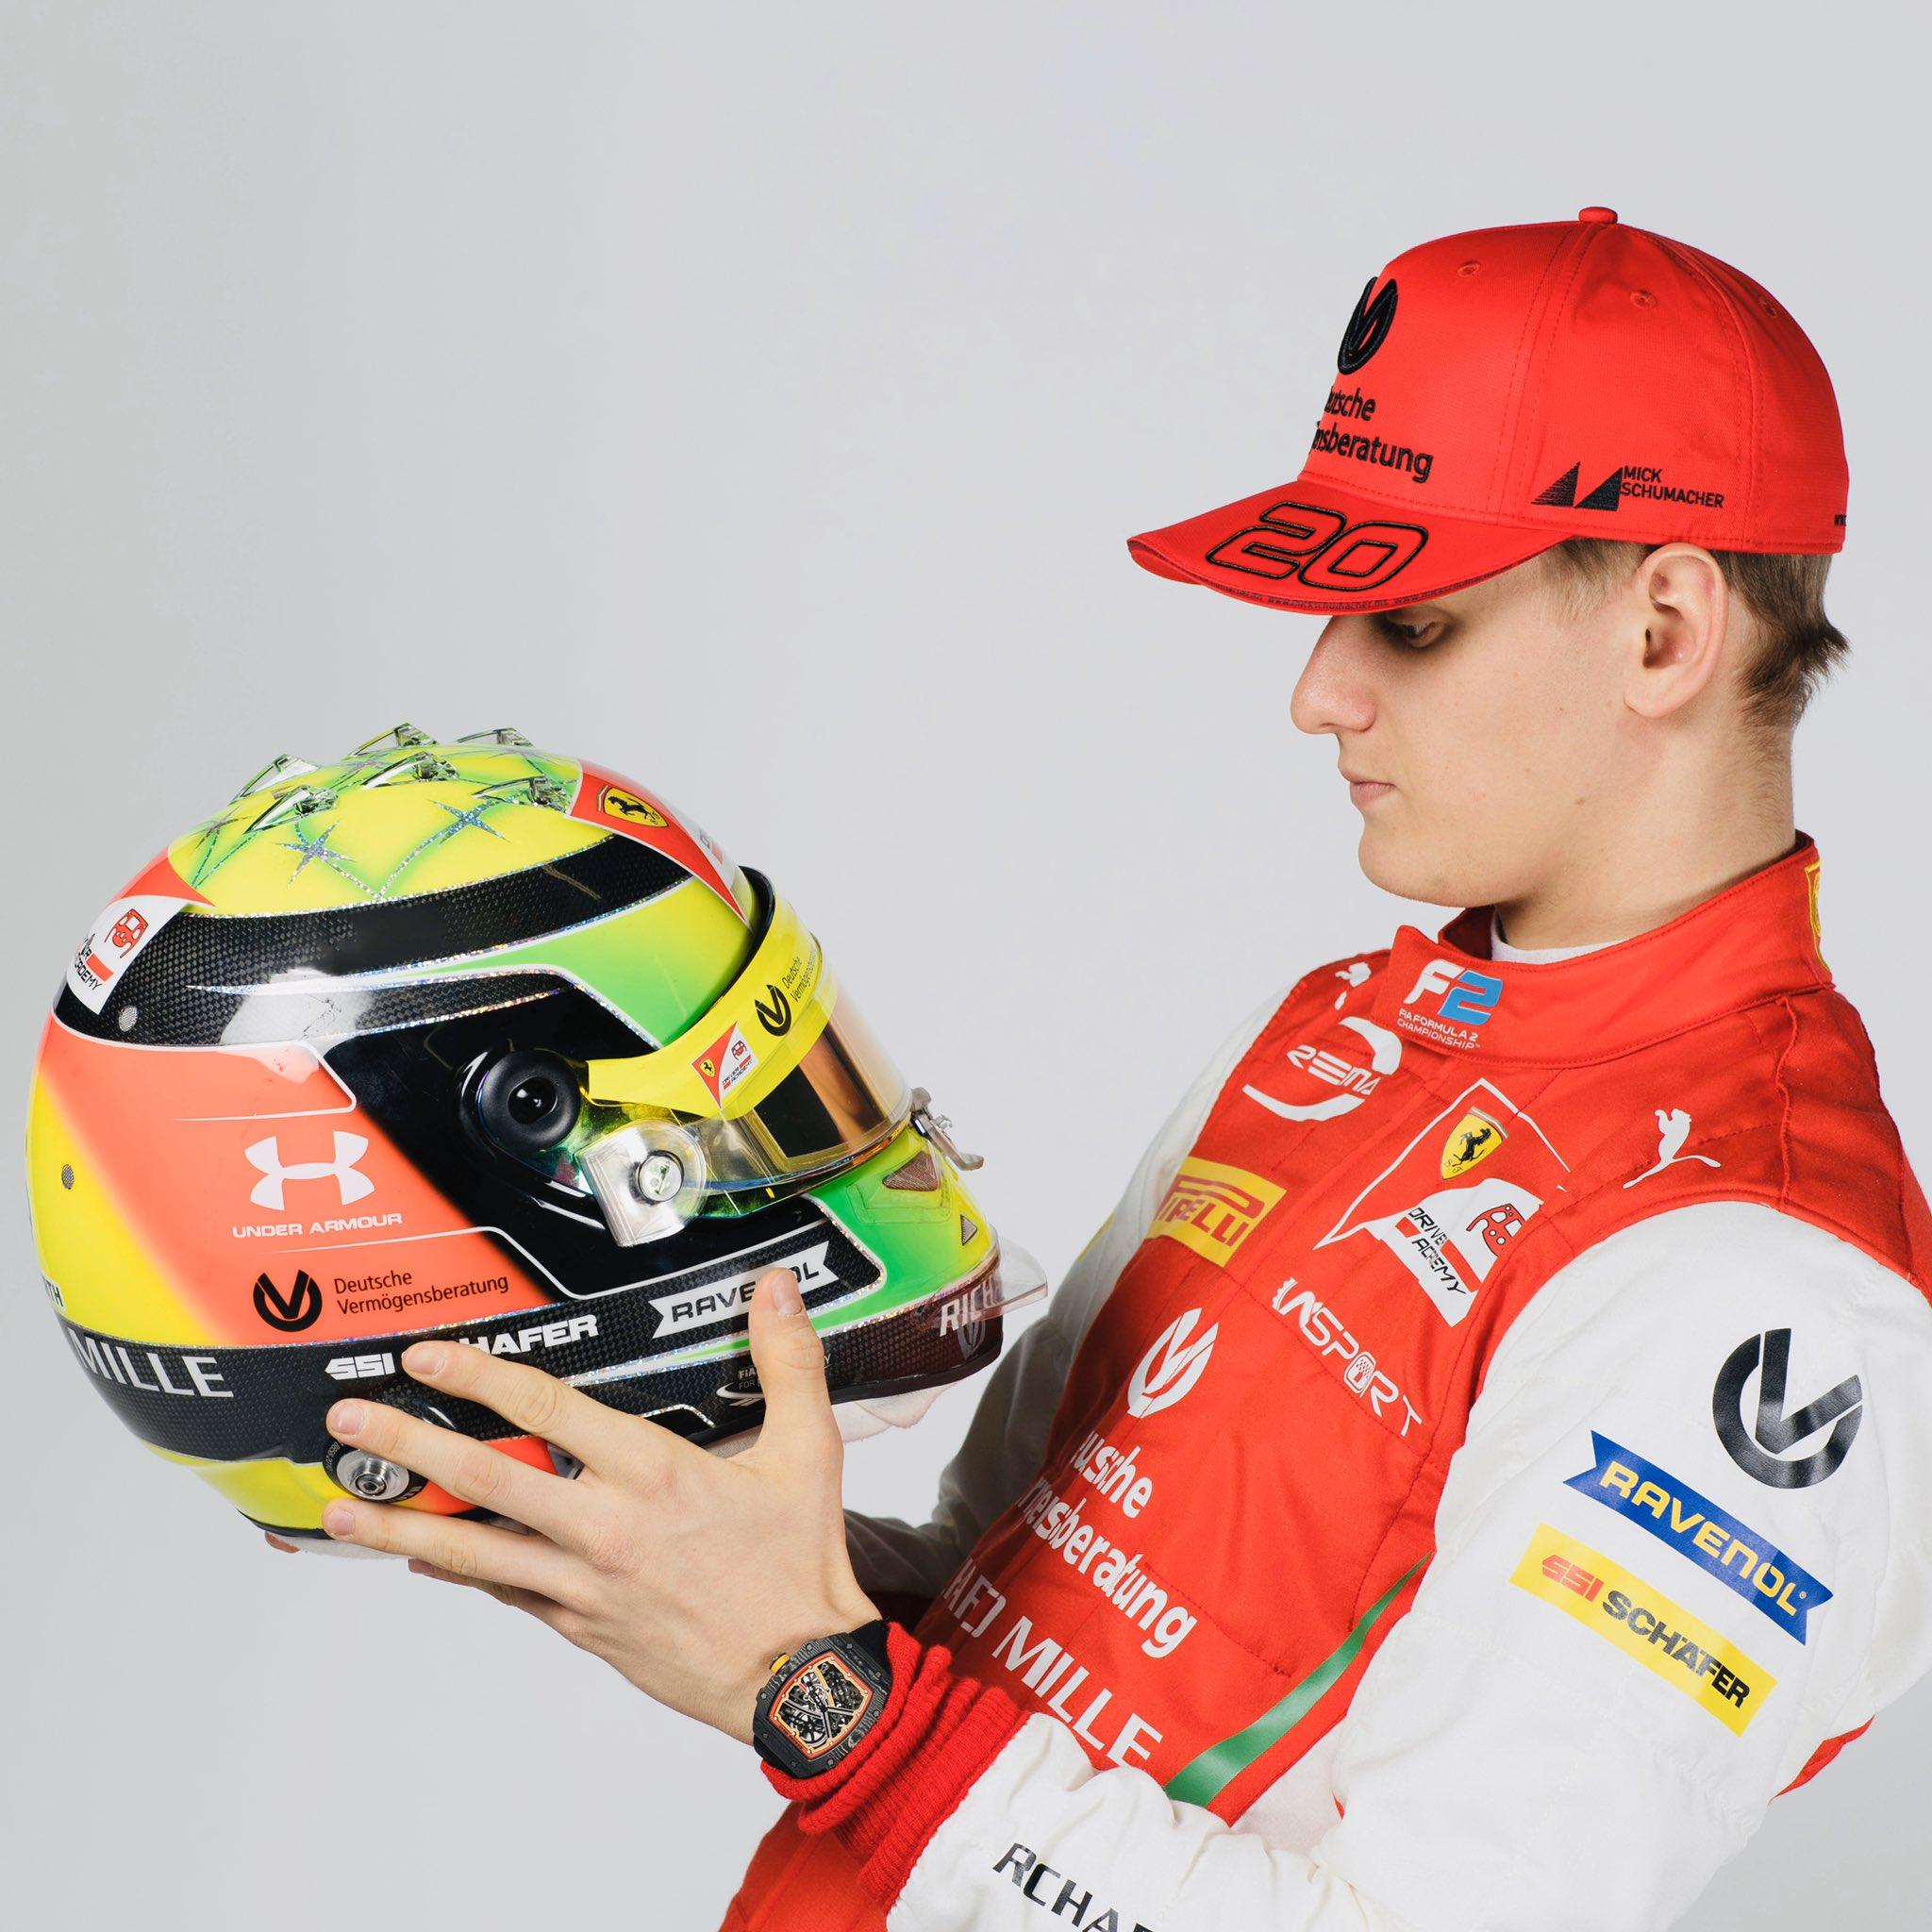 Мик Шумахер, Формула-2